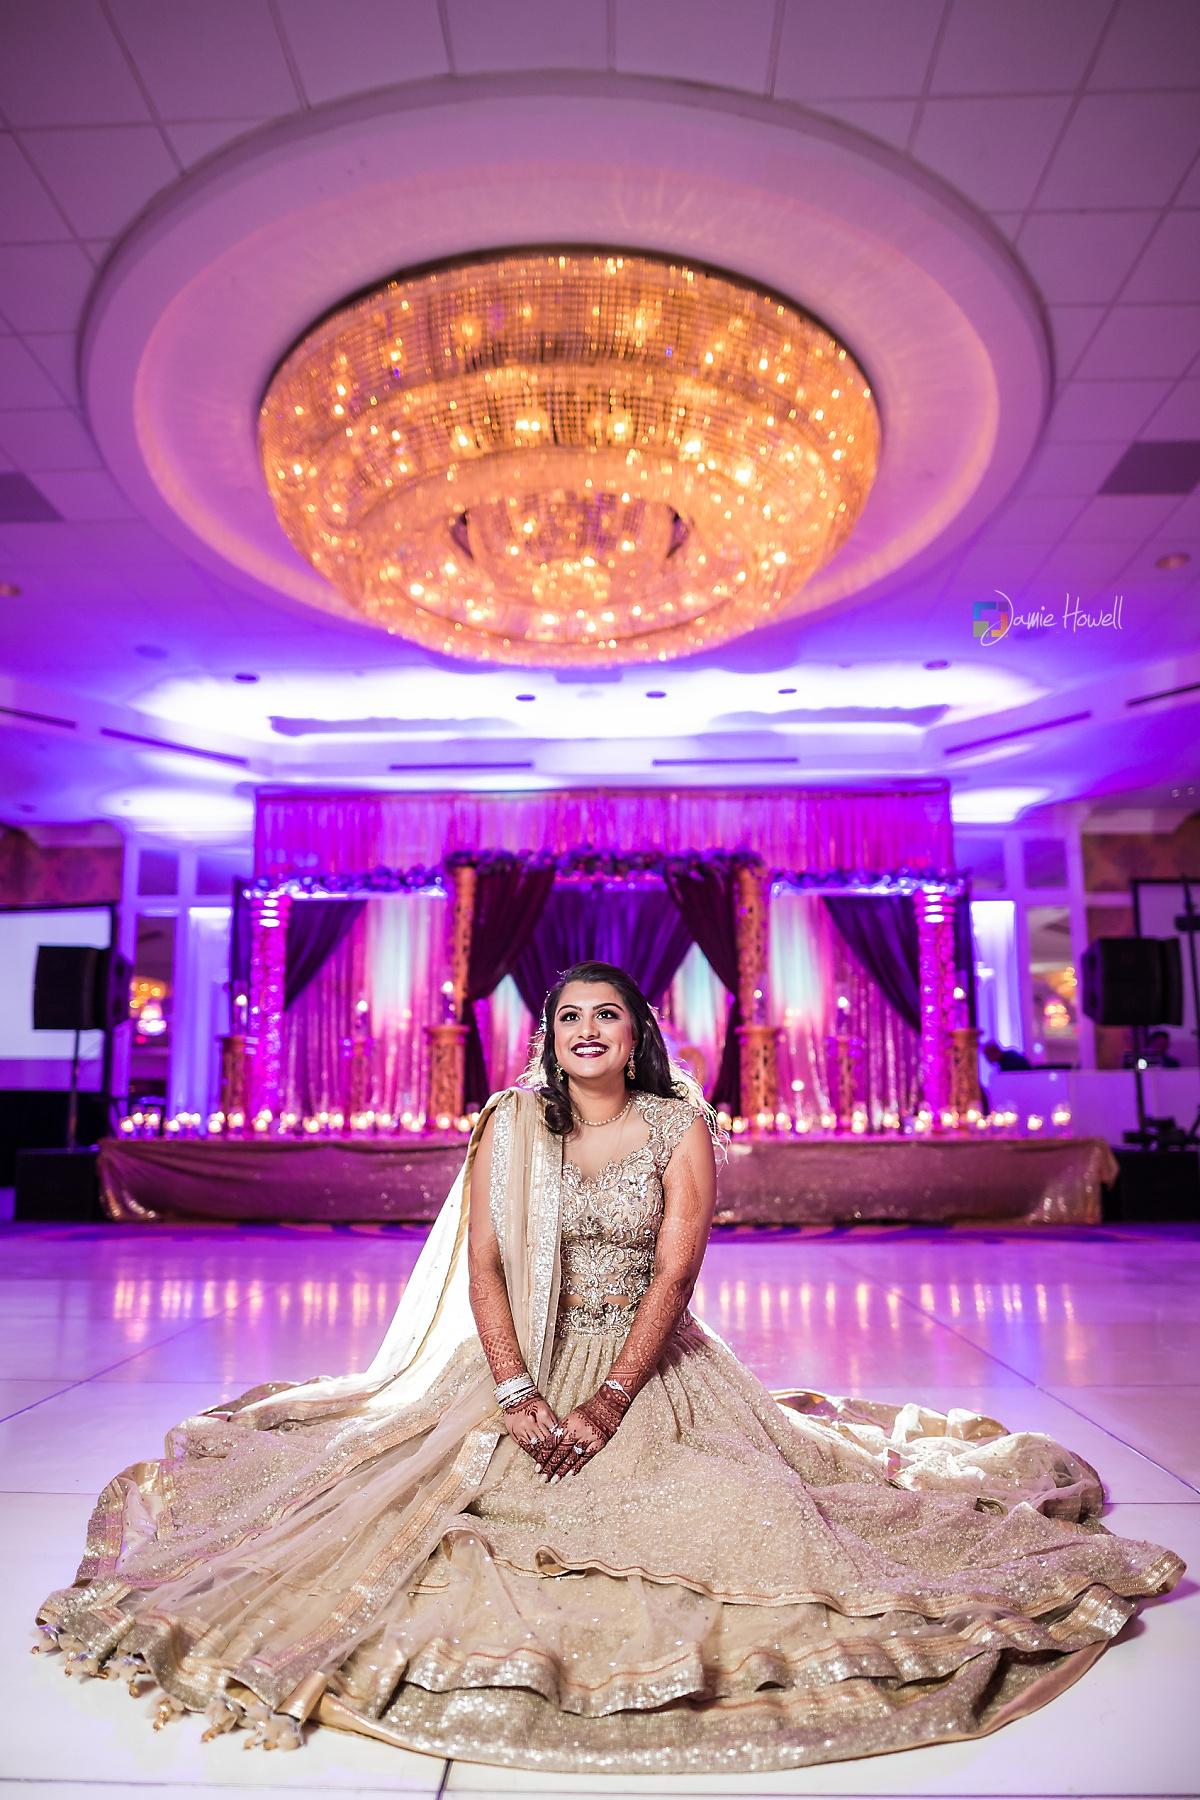 Hilton Charlotte Center South Asian Wedding (53)